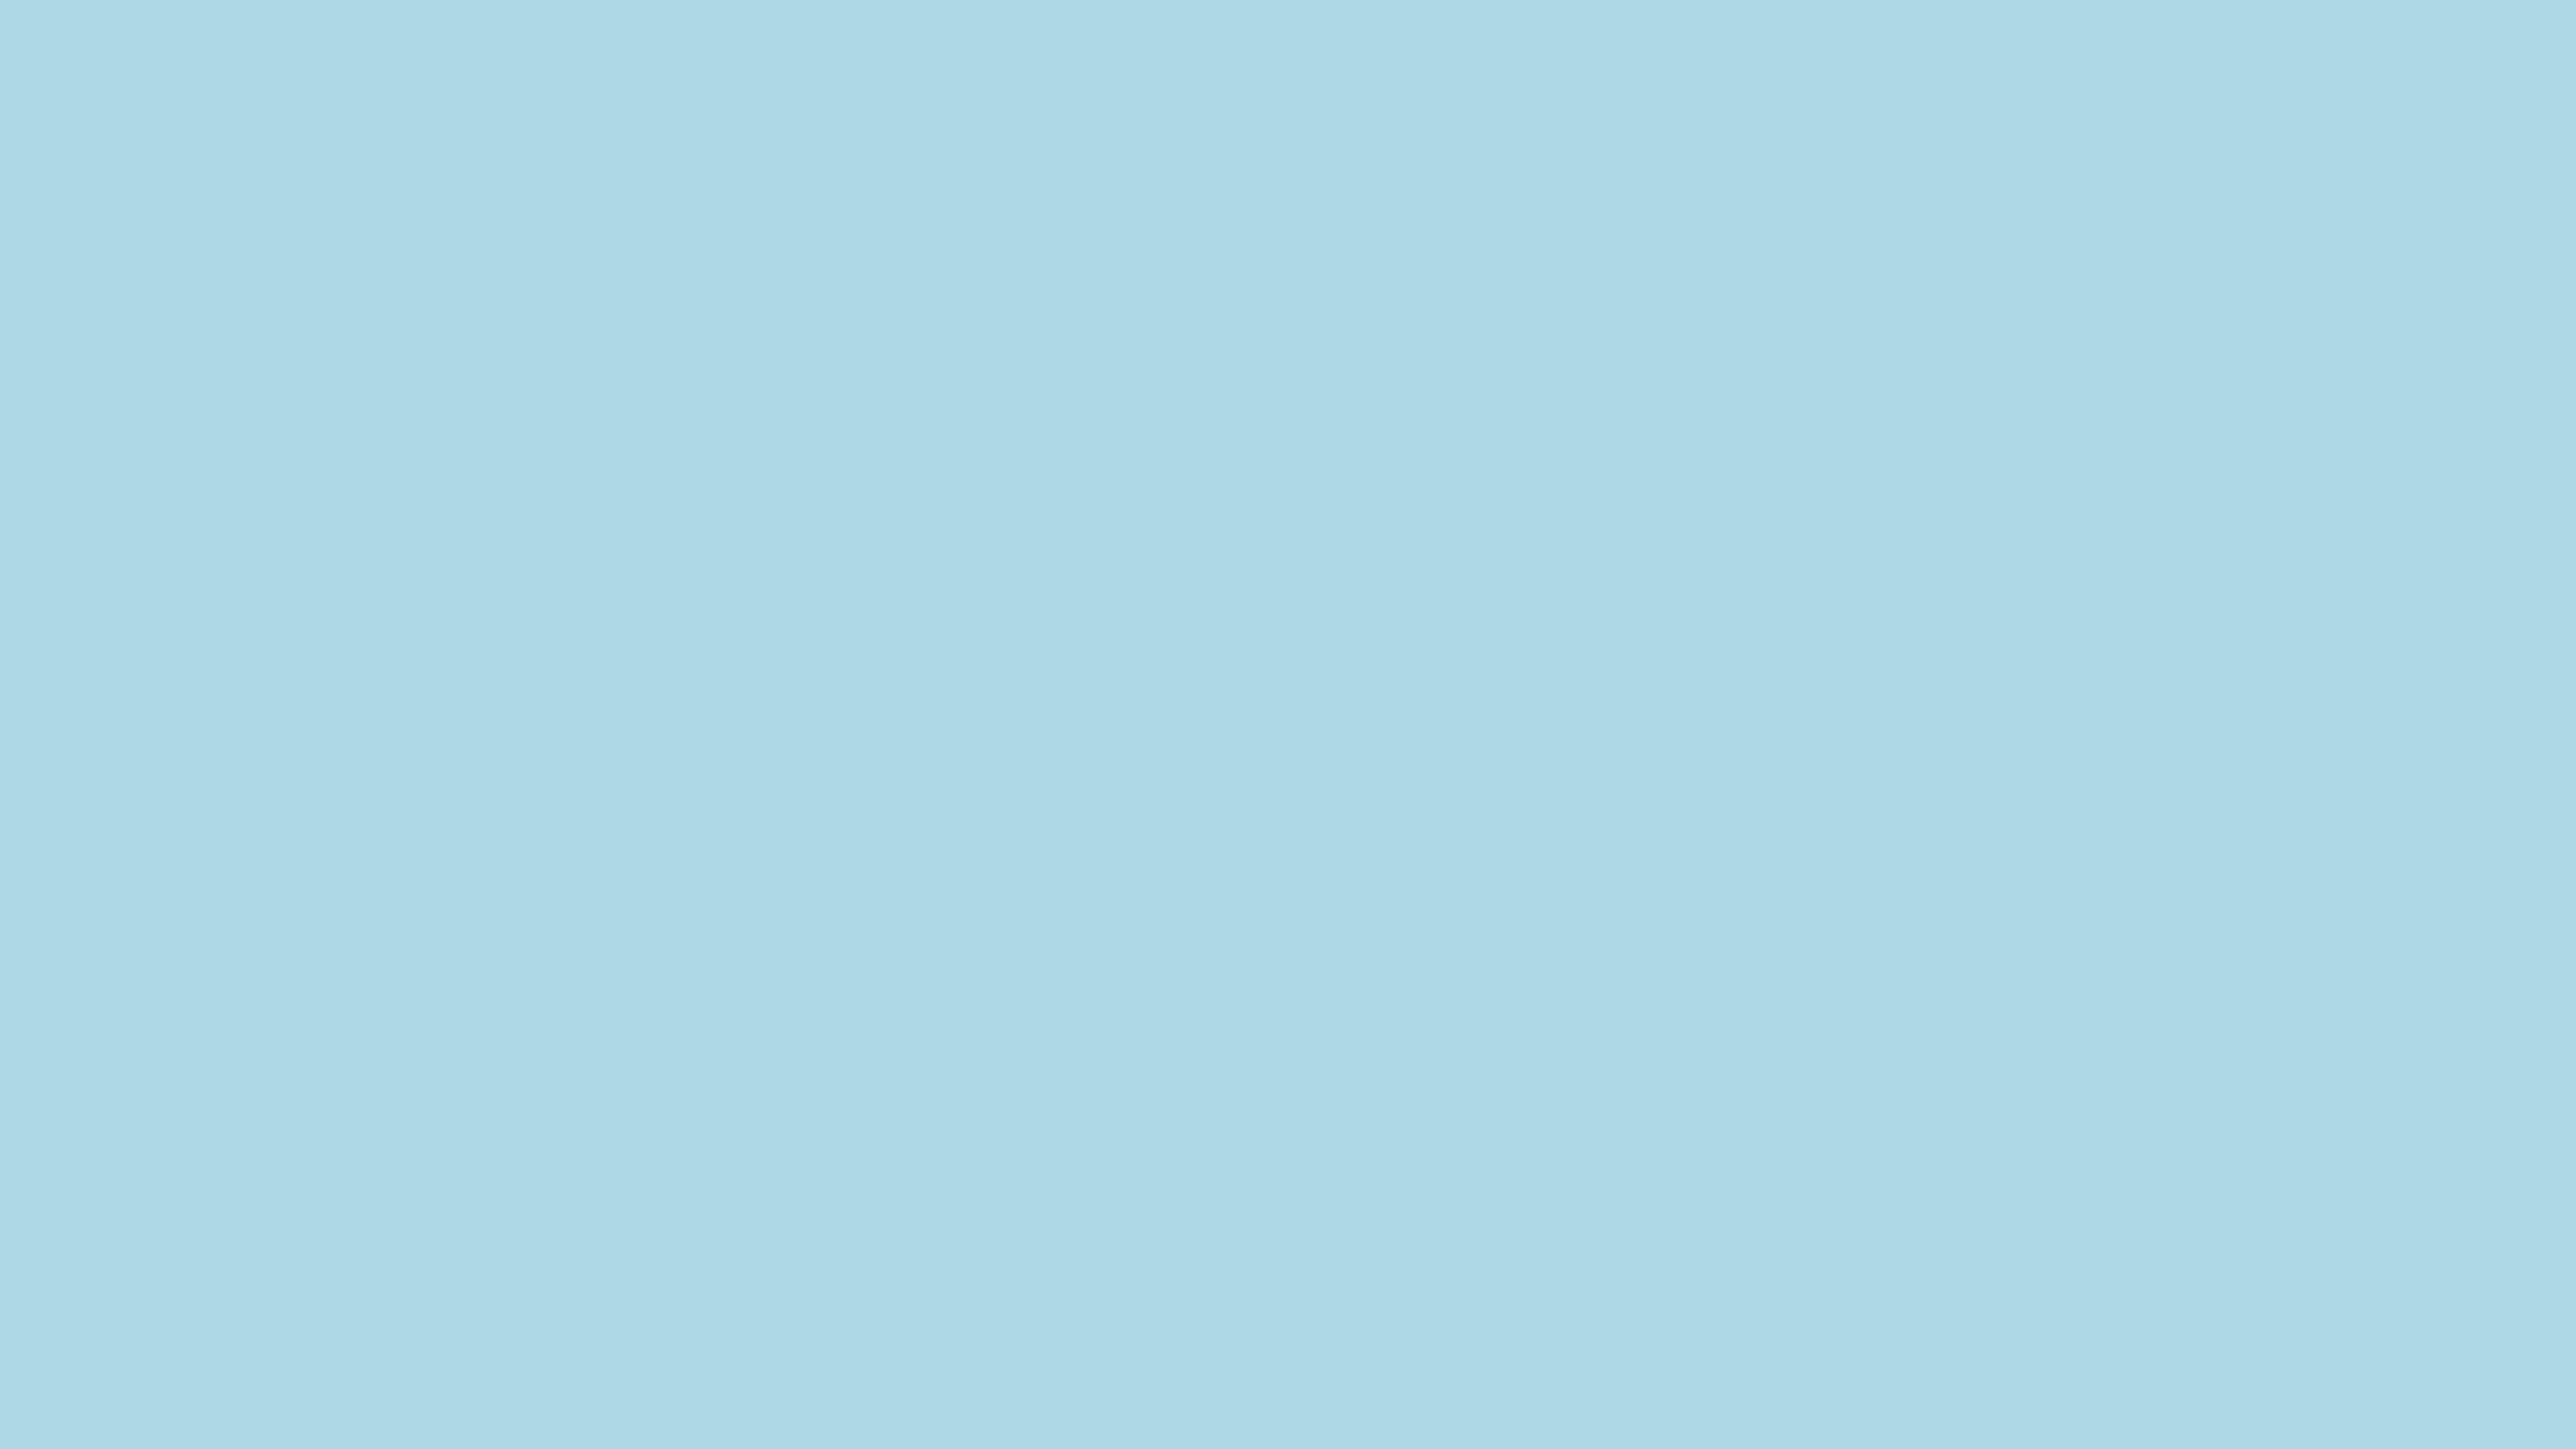 7680x4320 Light Blue Solid Color Background